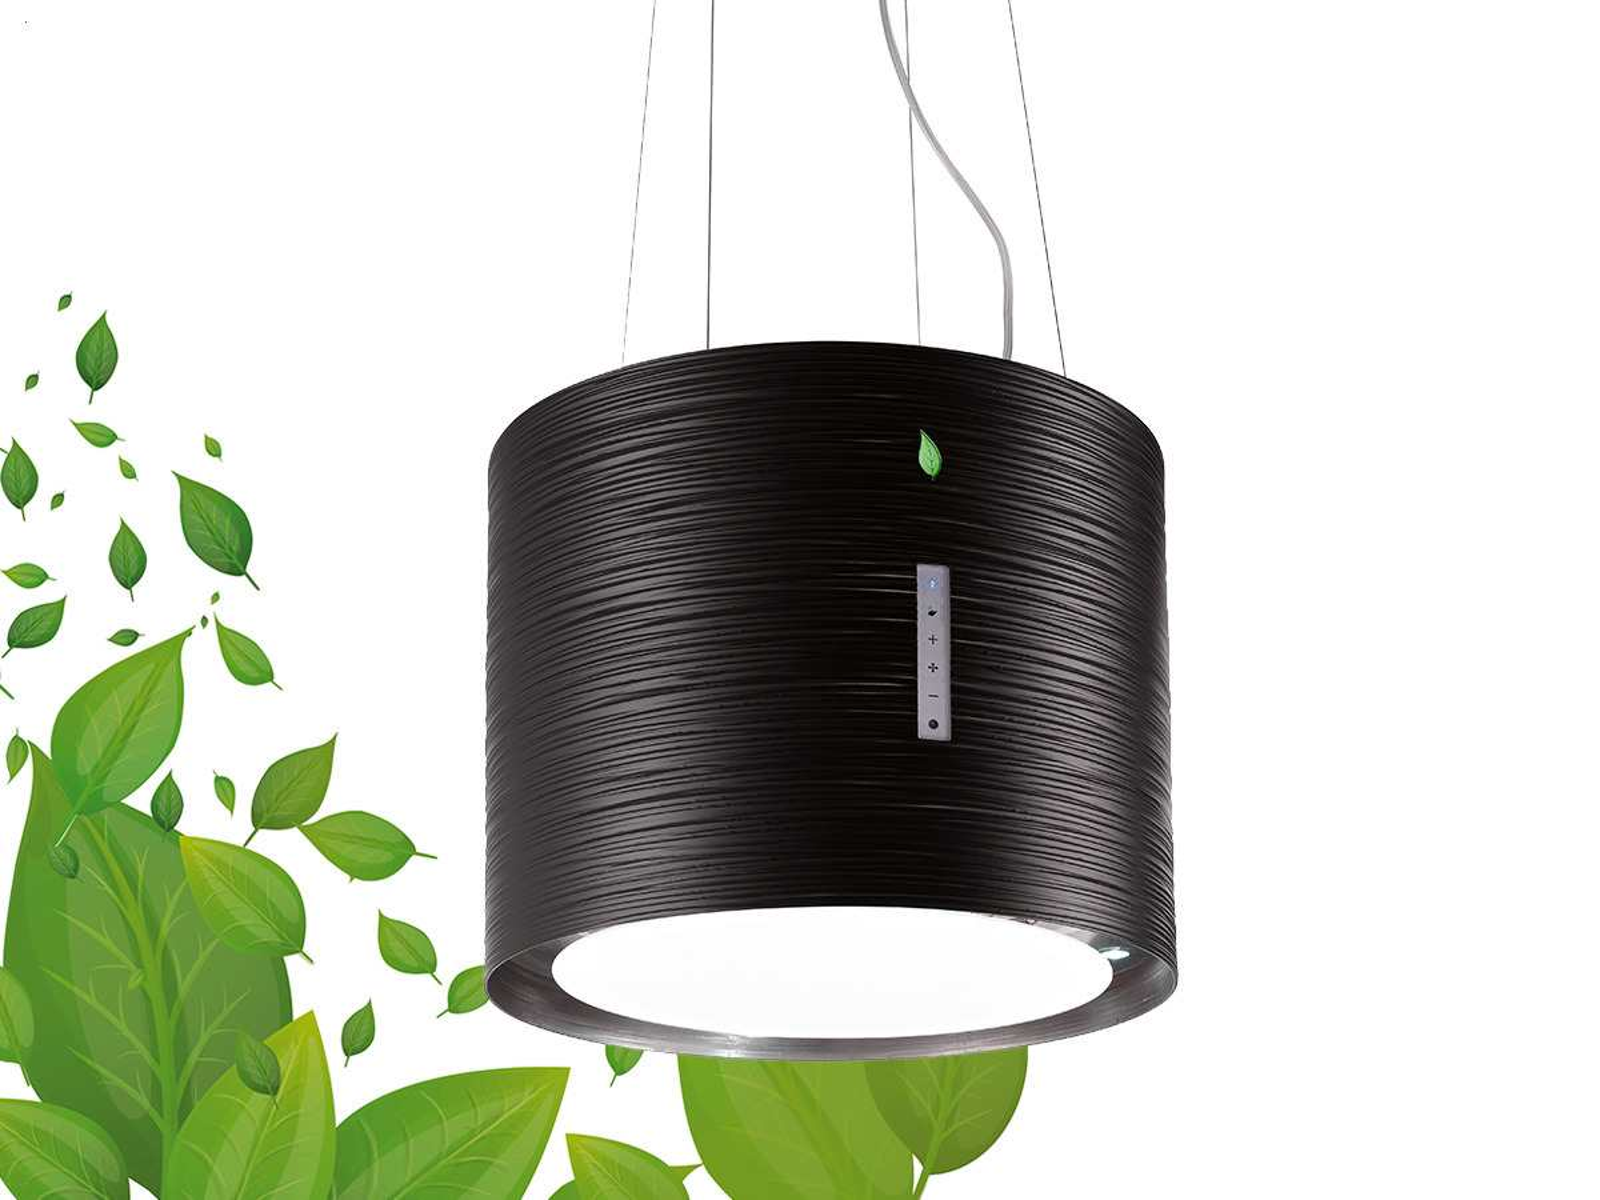 falmec twister inselhaube schwarz. Black Bedroom Furniture Sets. Home Design Ideas